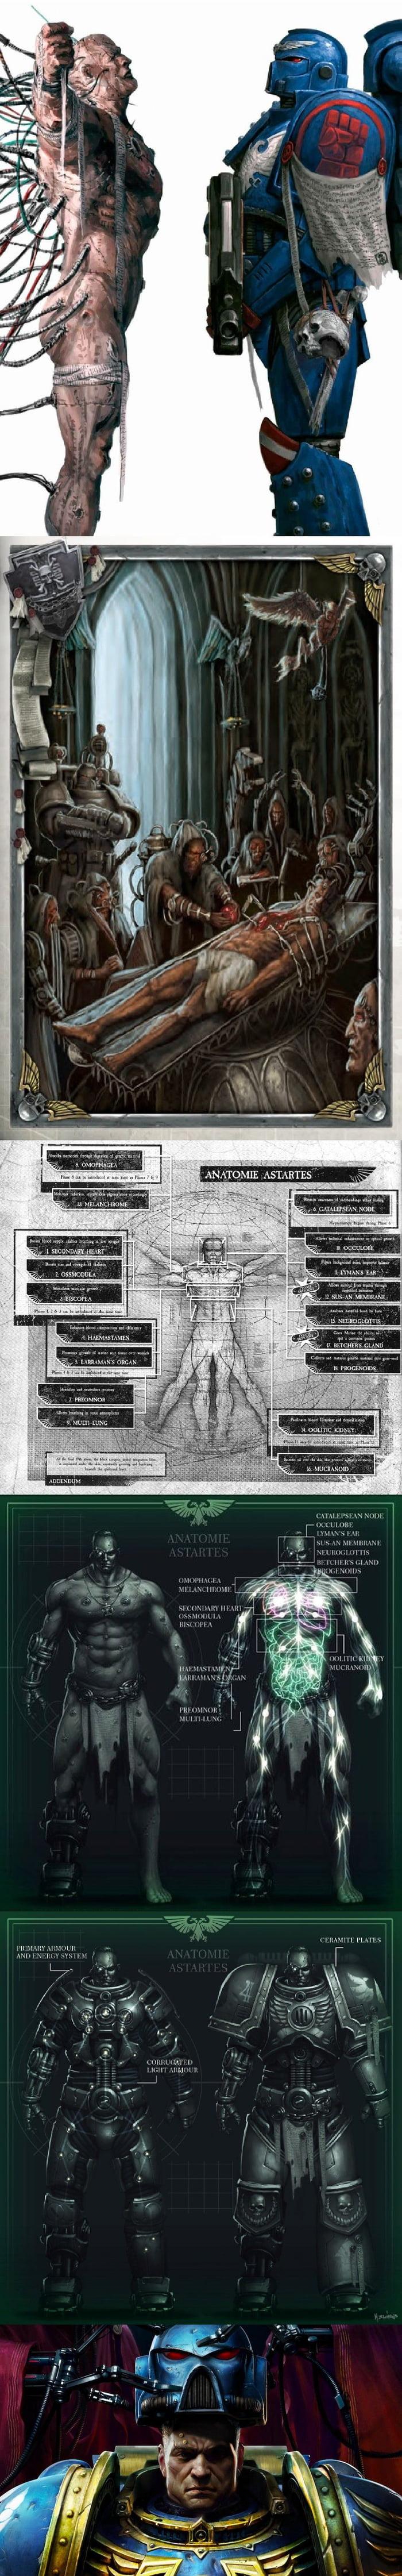 Anatomy of Space marine- Warhammer 40K. - 9GAG